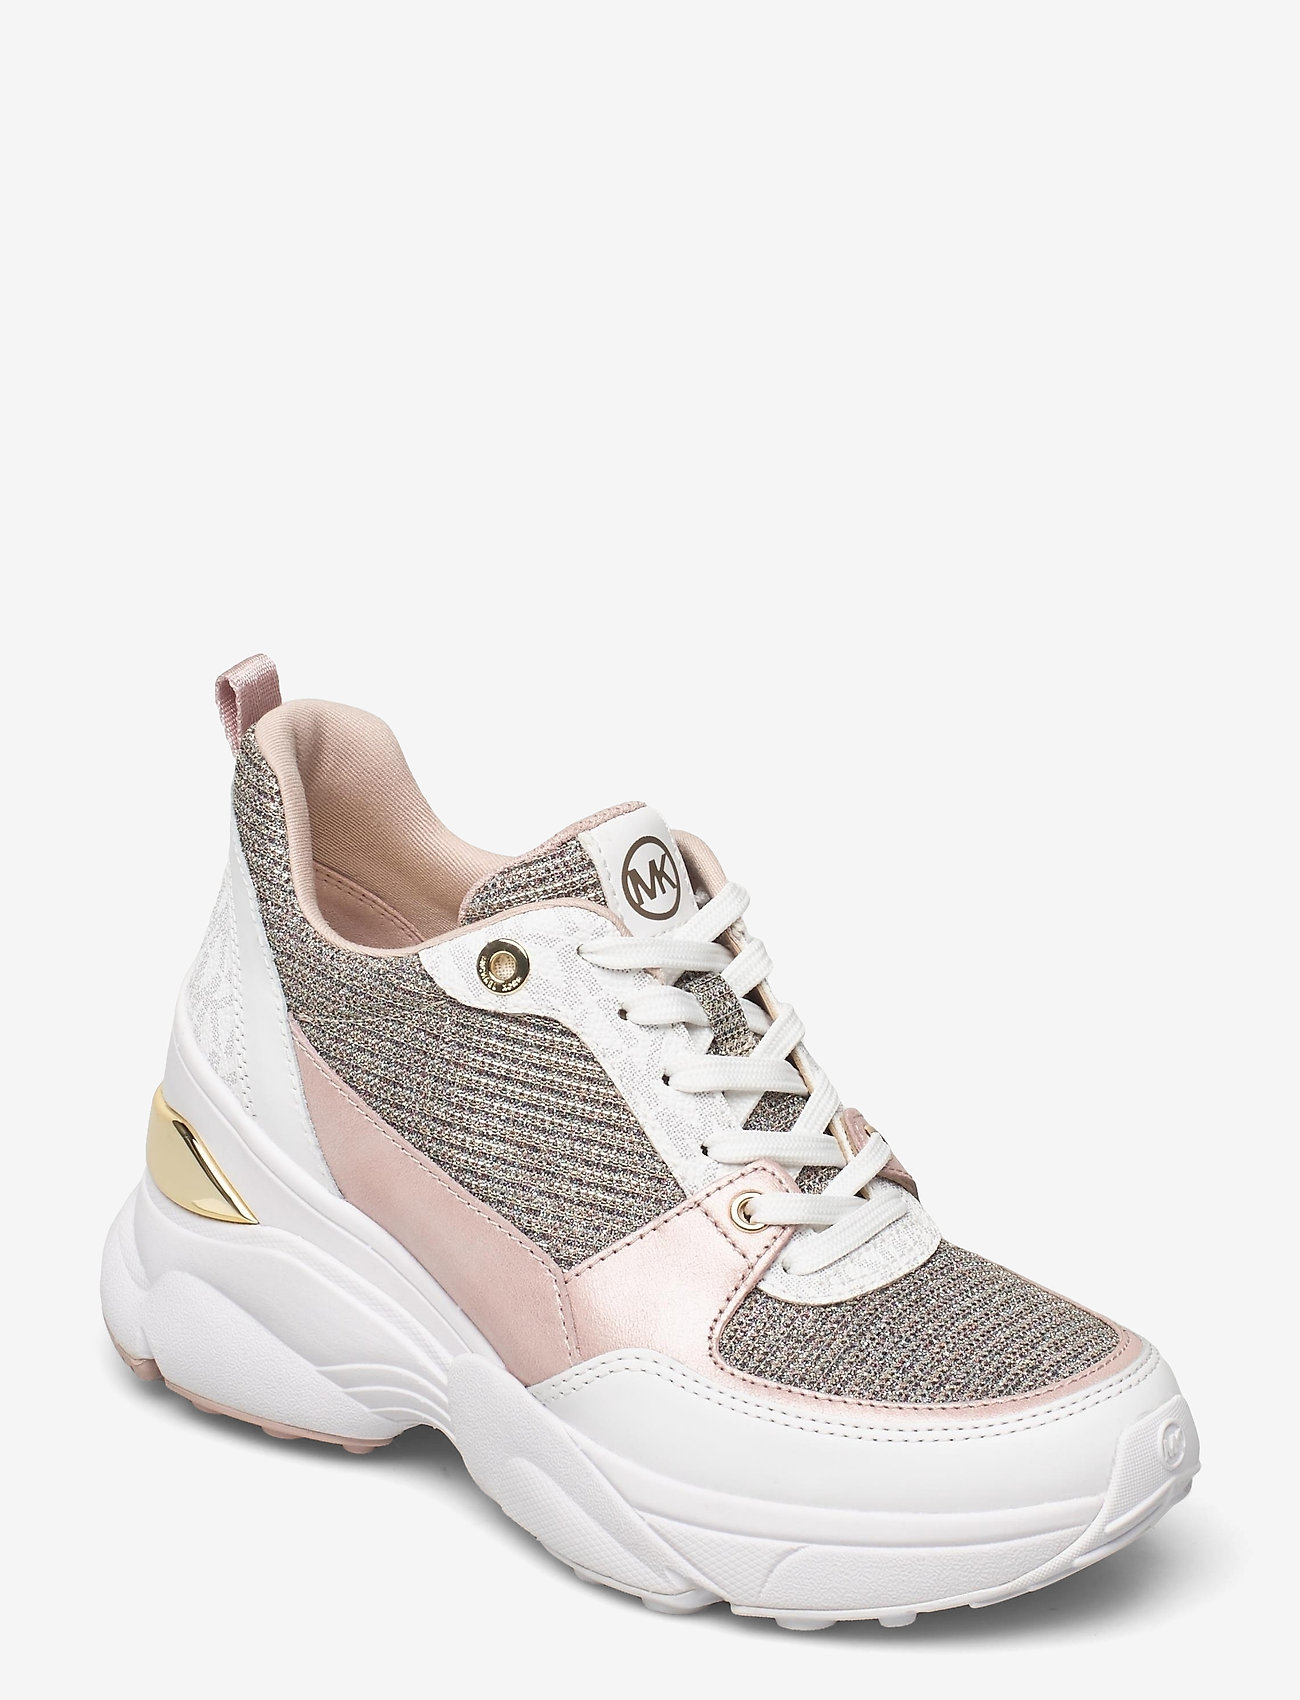 Michael Kors - MICKEY TRAINER - chunky sneakers - wht rainbow - 0